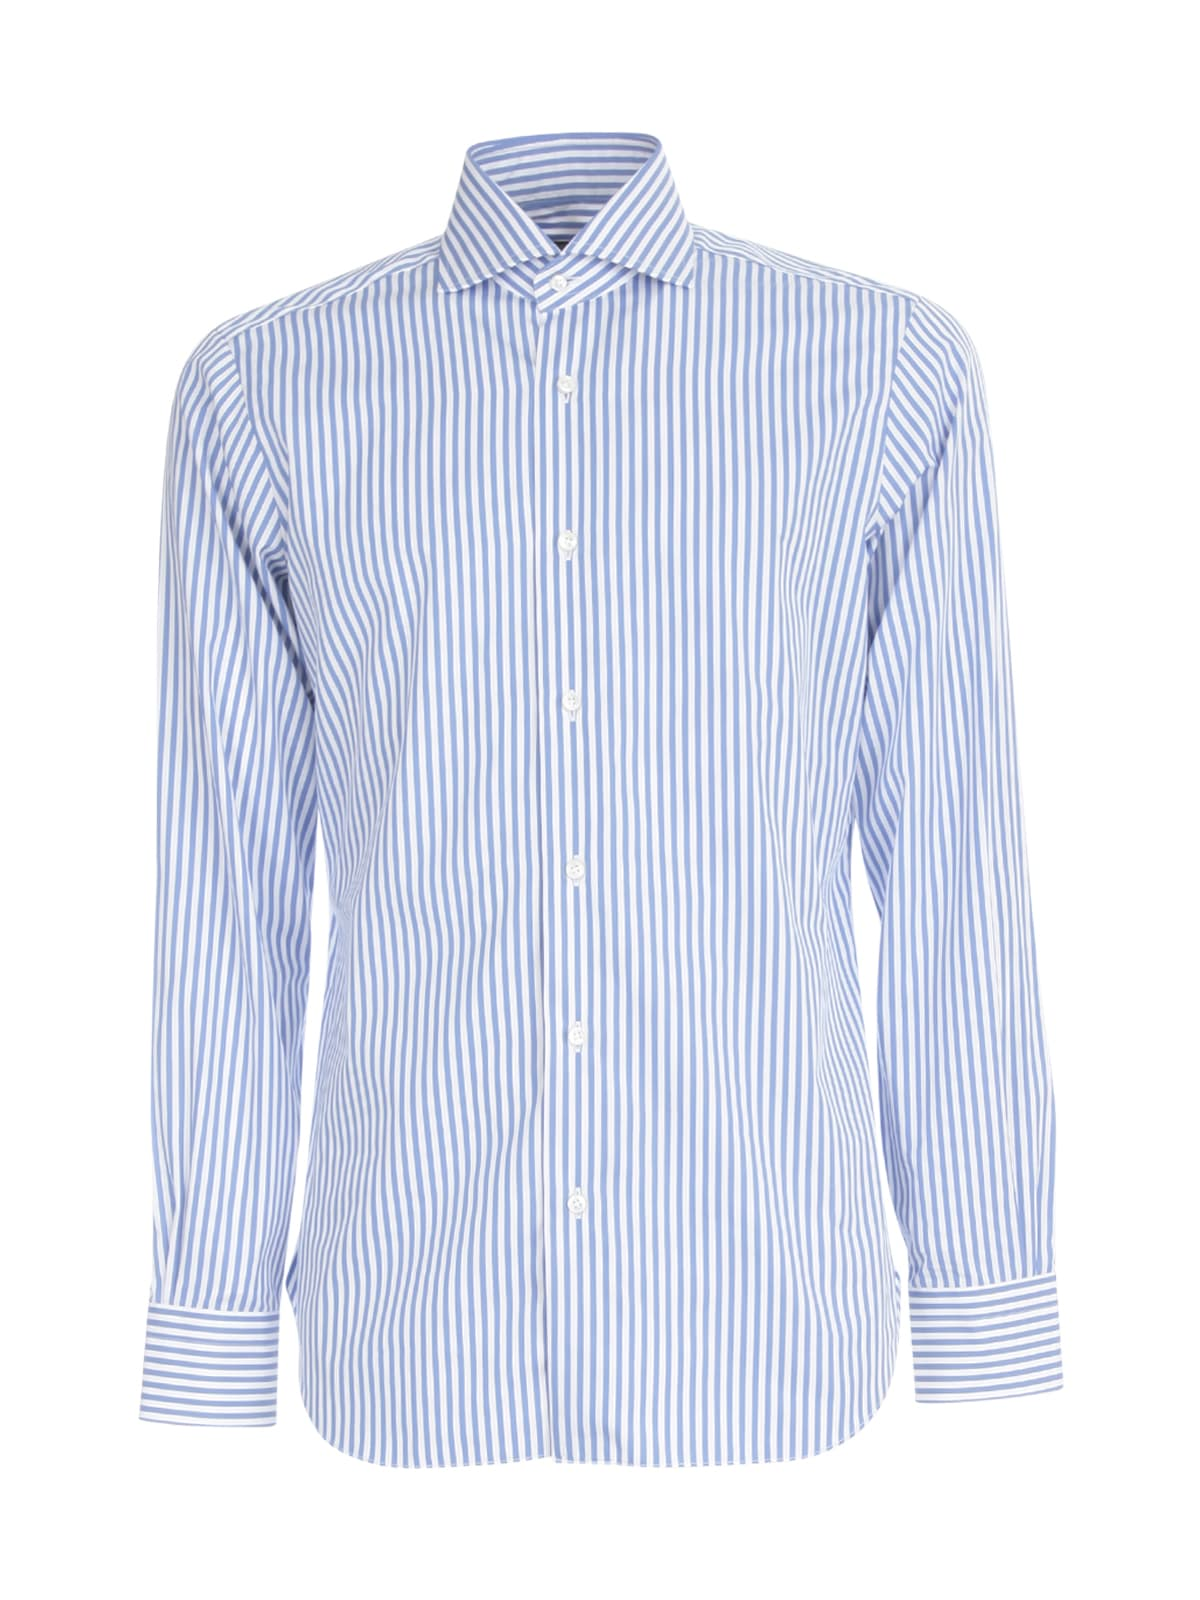 Wanded Shirt